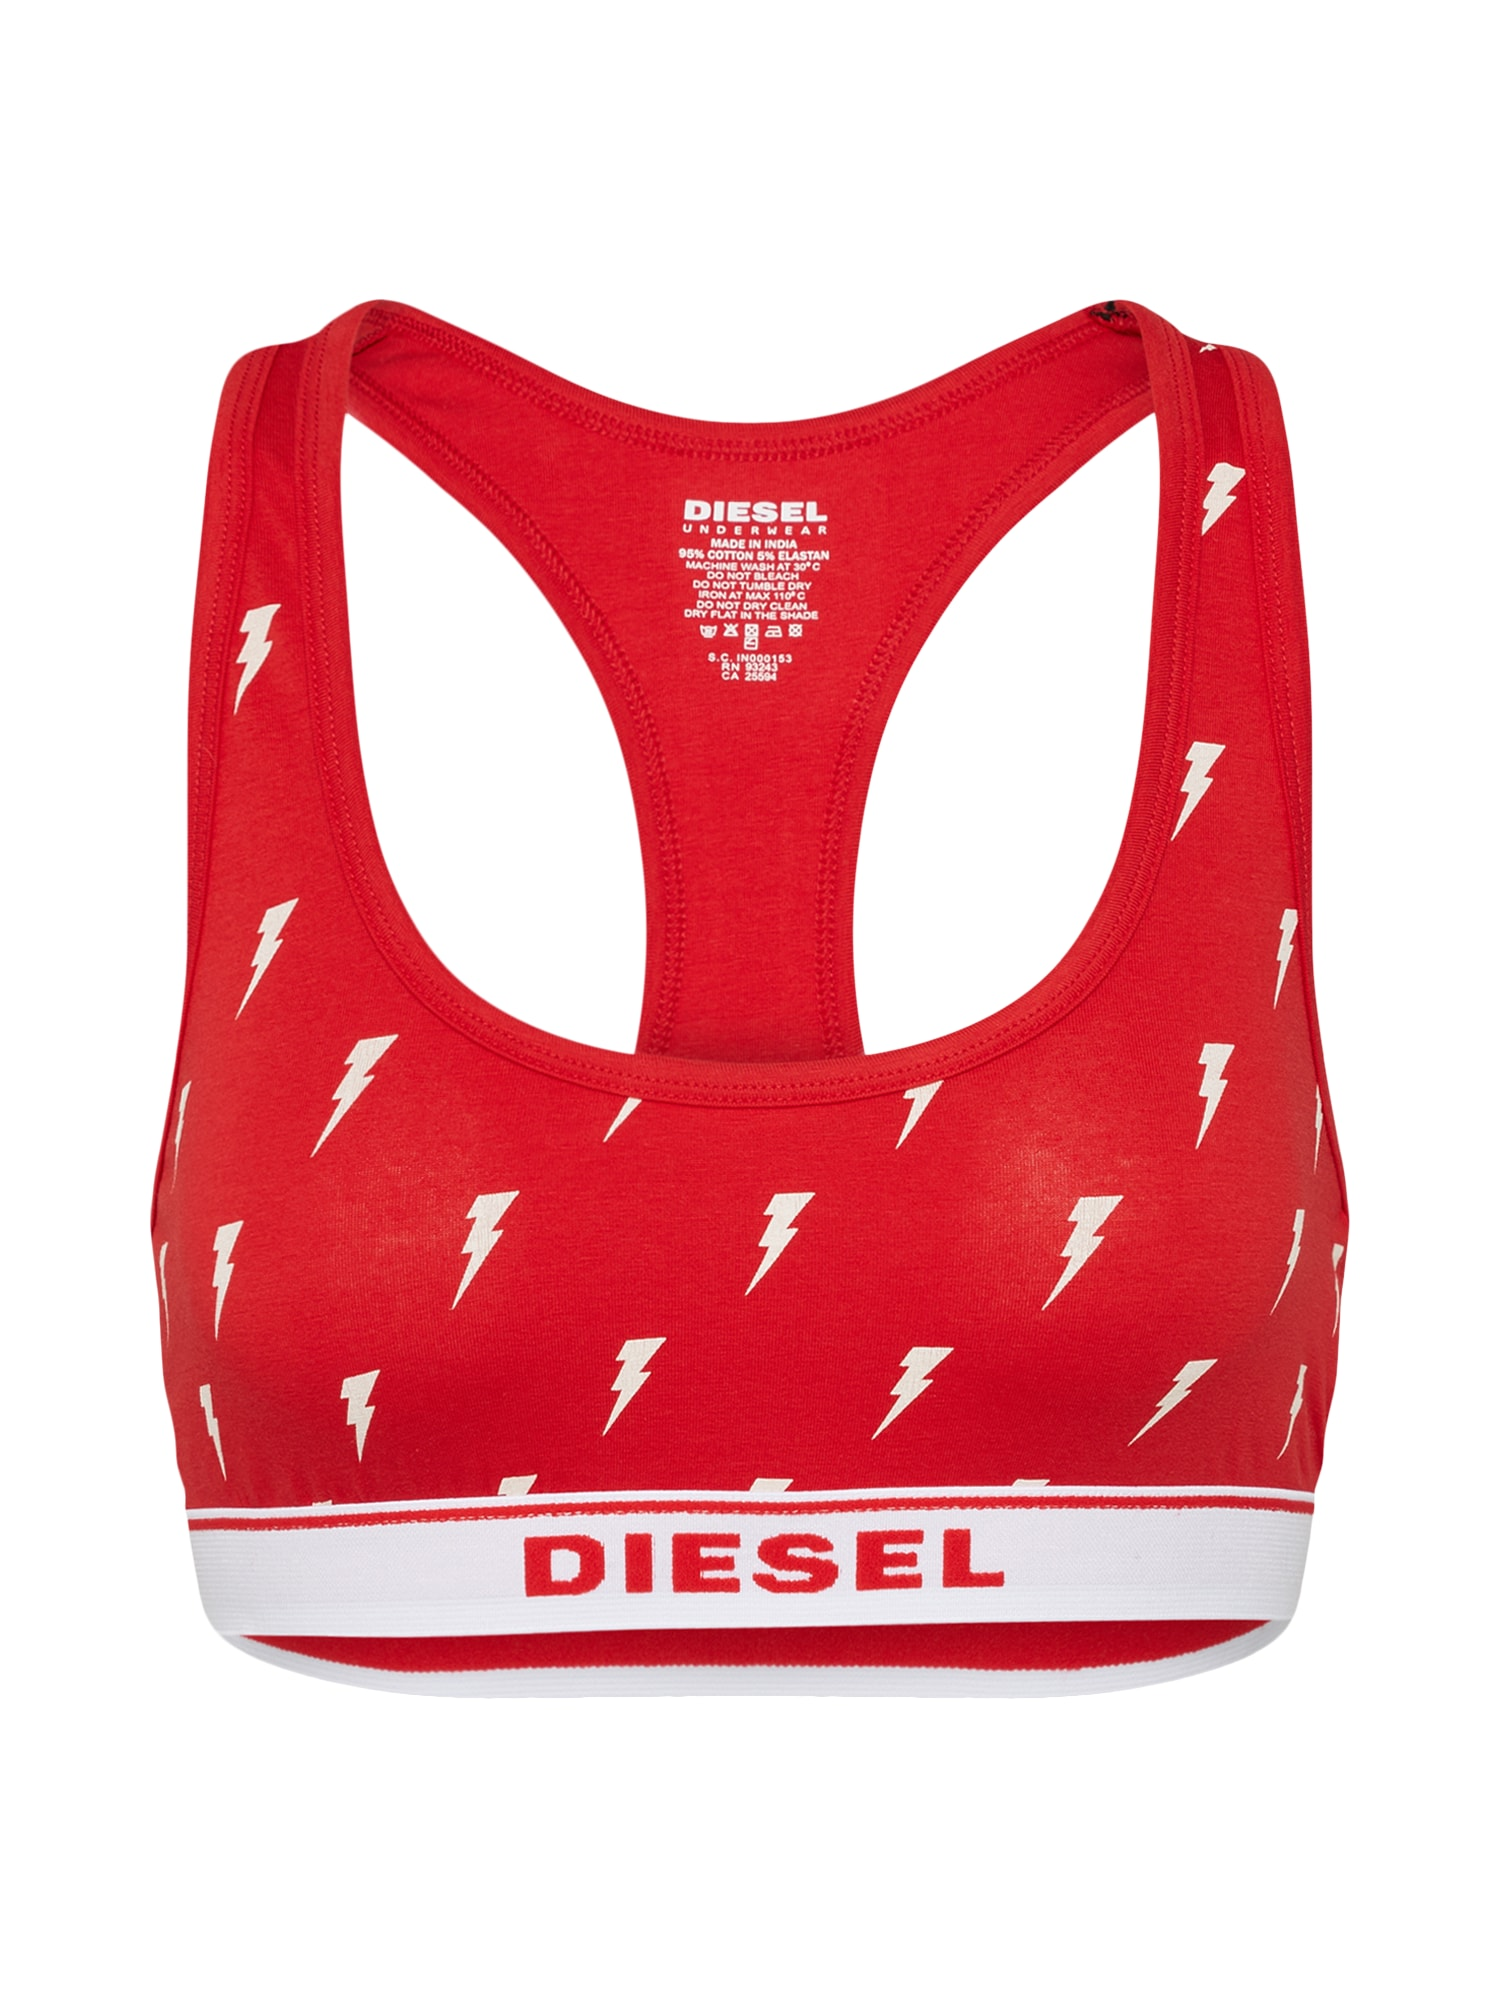 DIESEL Dames BH UFSB-MILEY rood wit